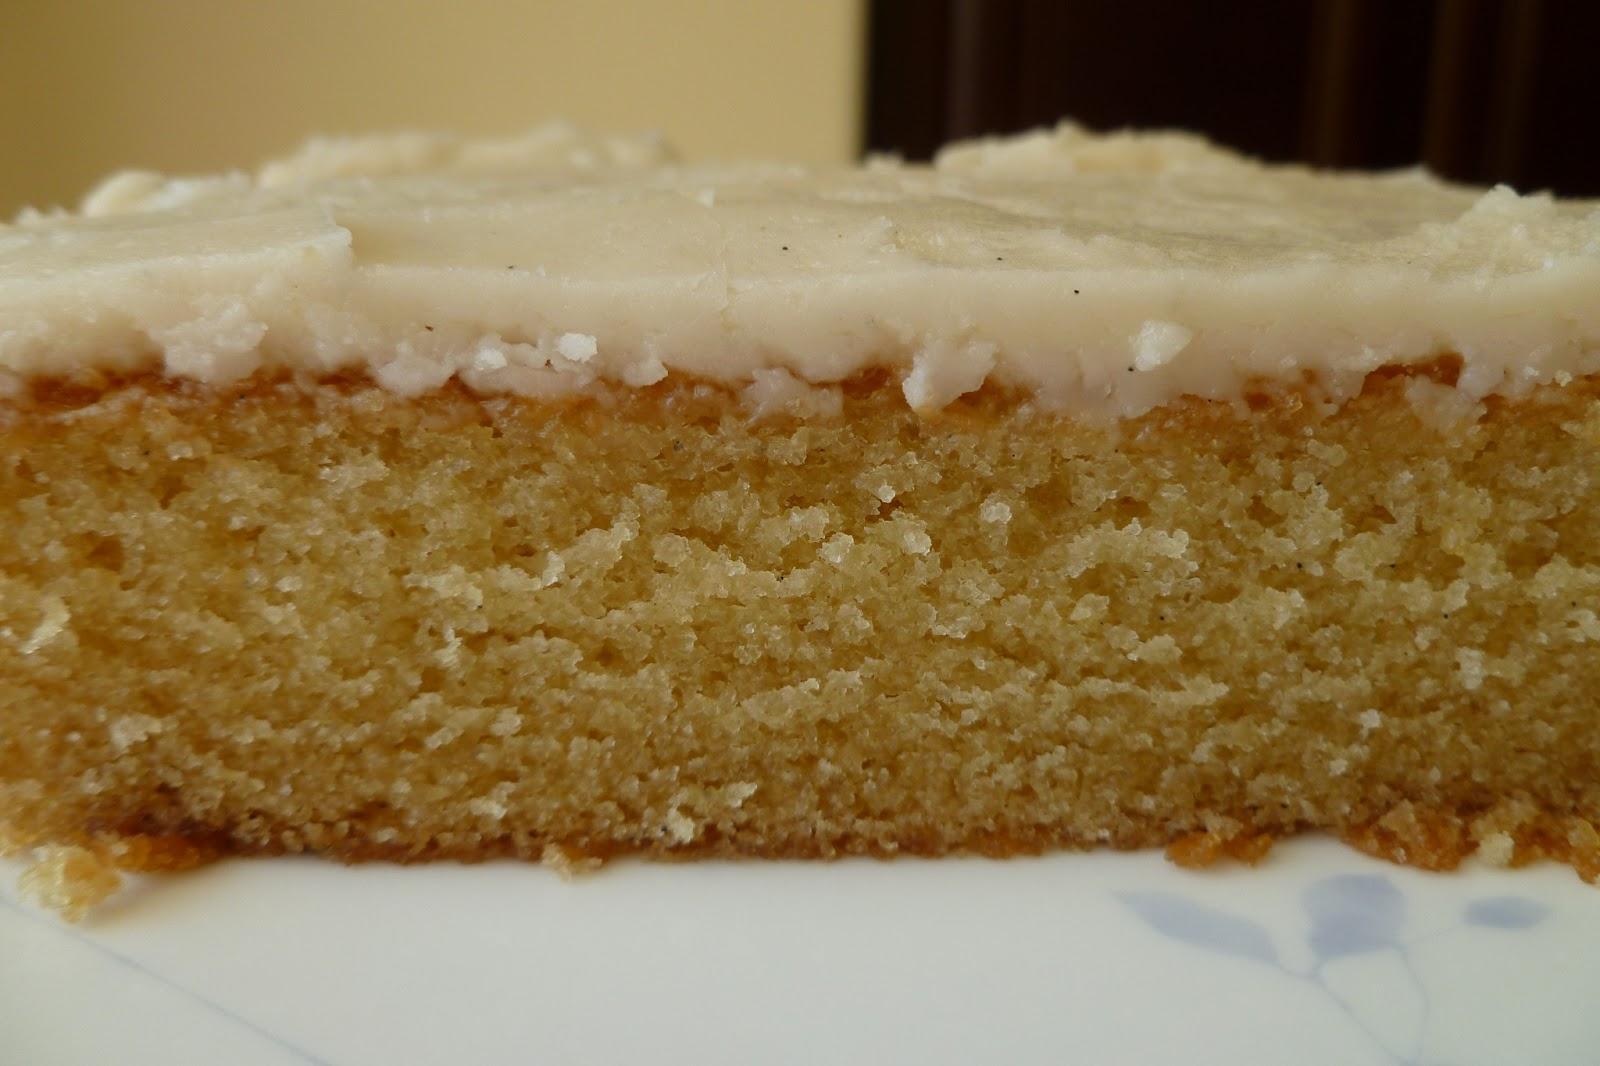 Sheet cake from mixes recipes